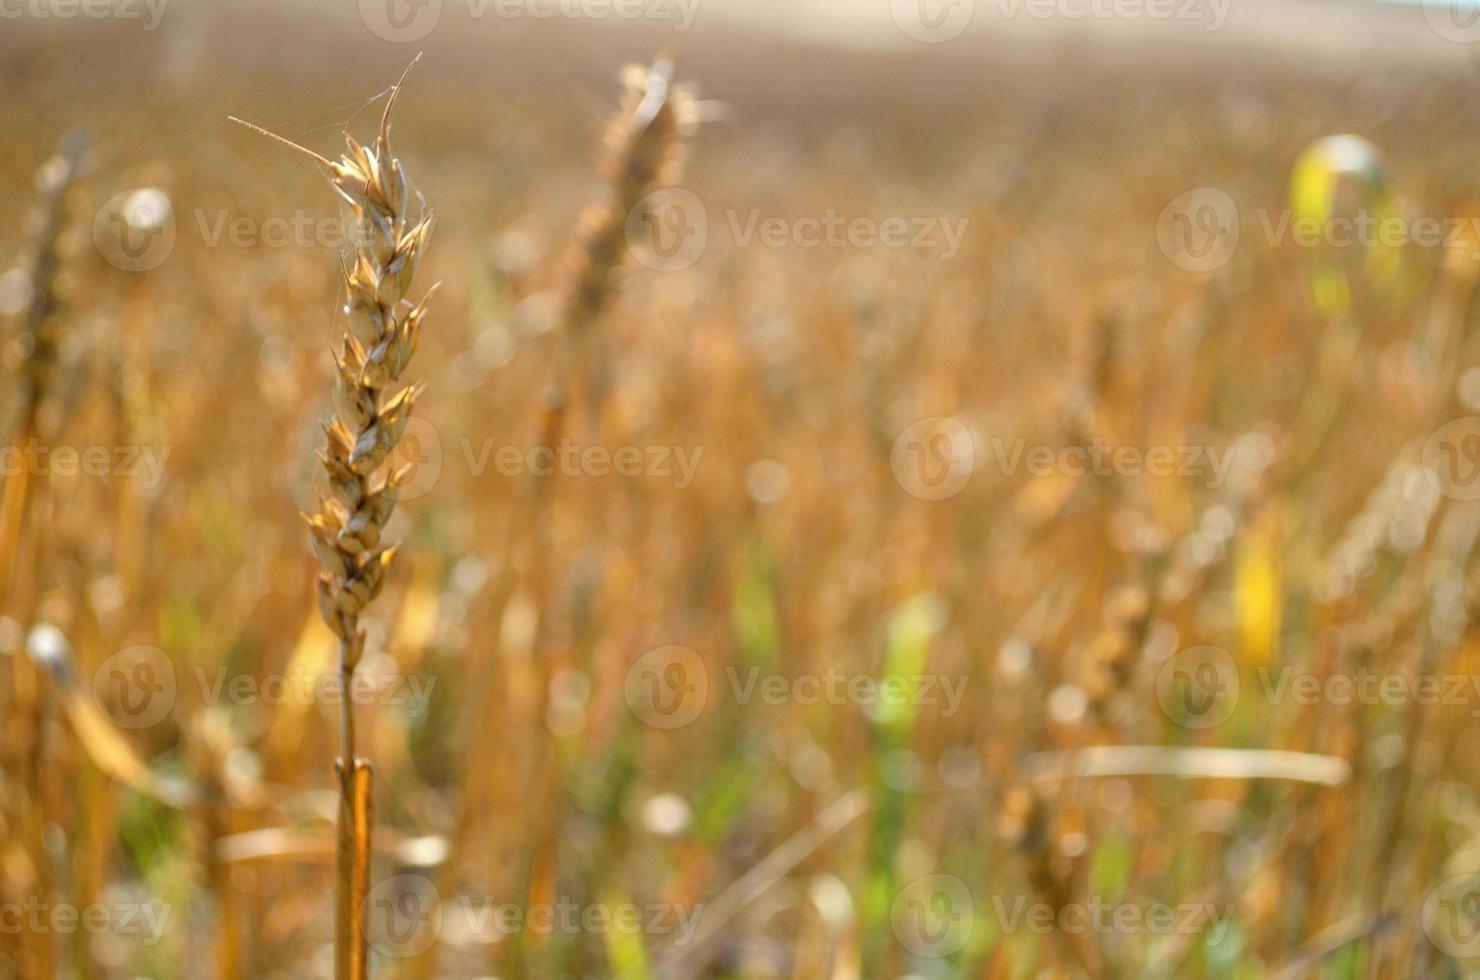 gyllene råg foto